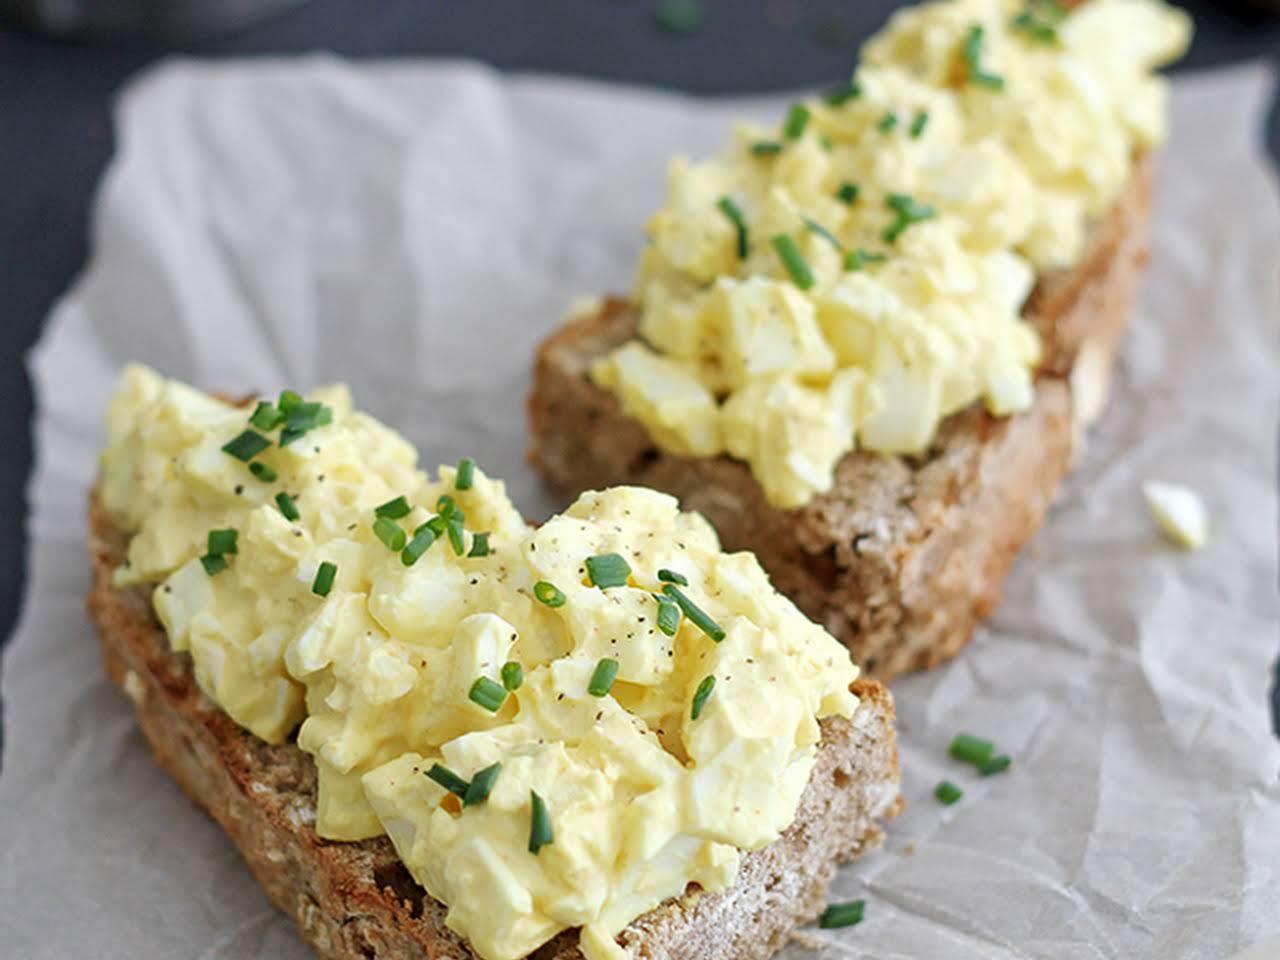 Paula Deen Potato Salad Recipe With Egg